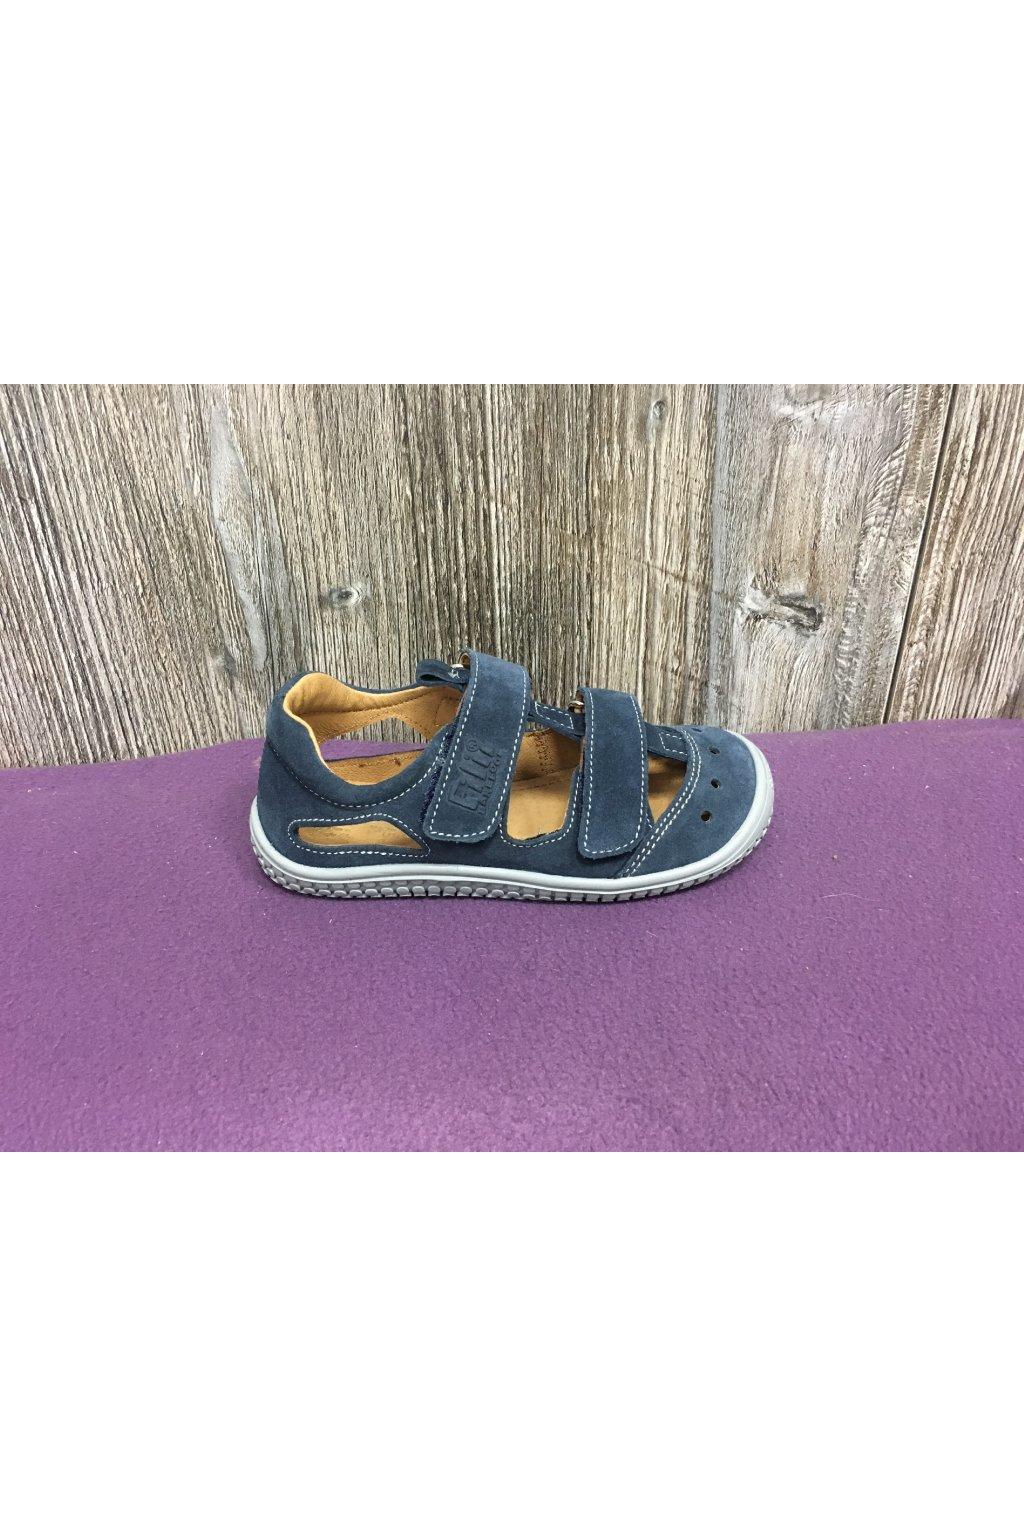 Filii Barefoot Ocean sandals - W